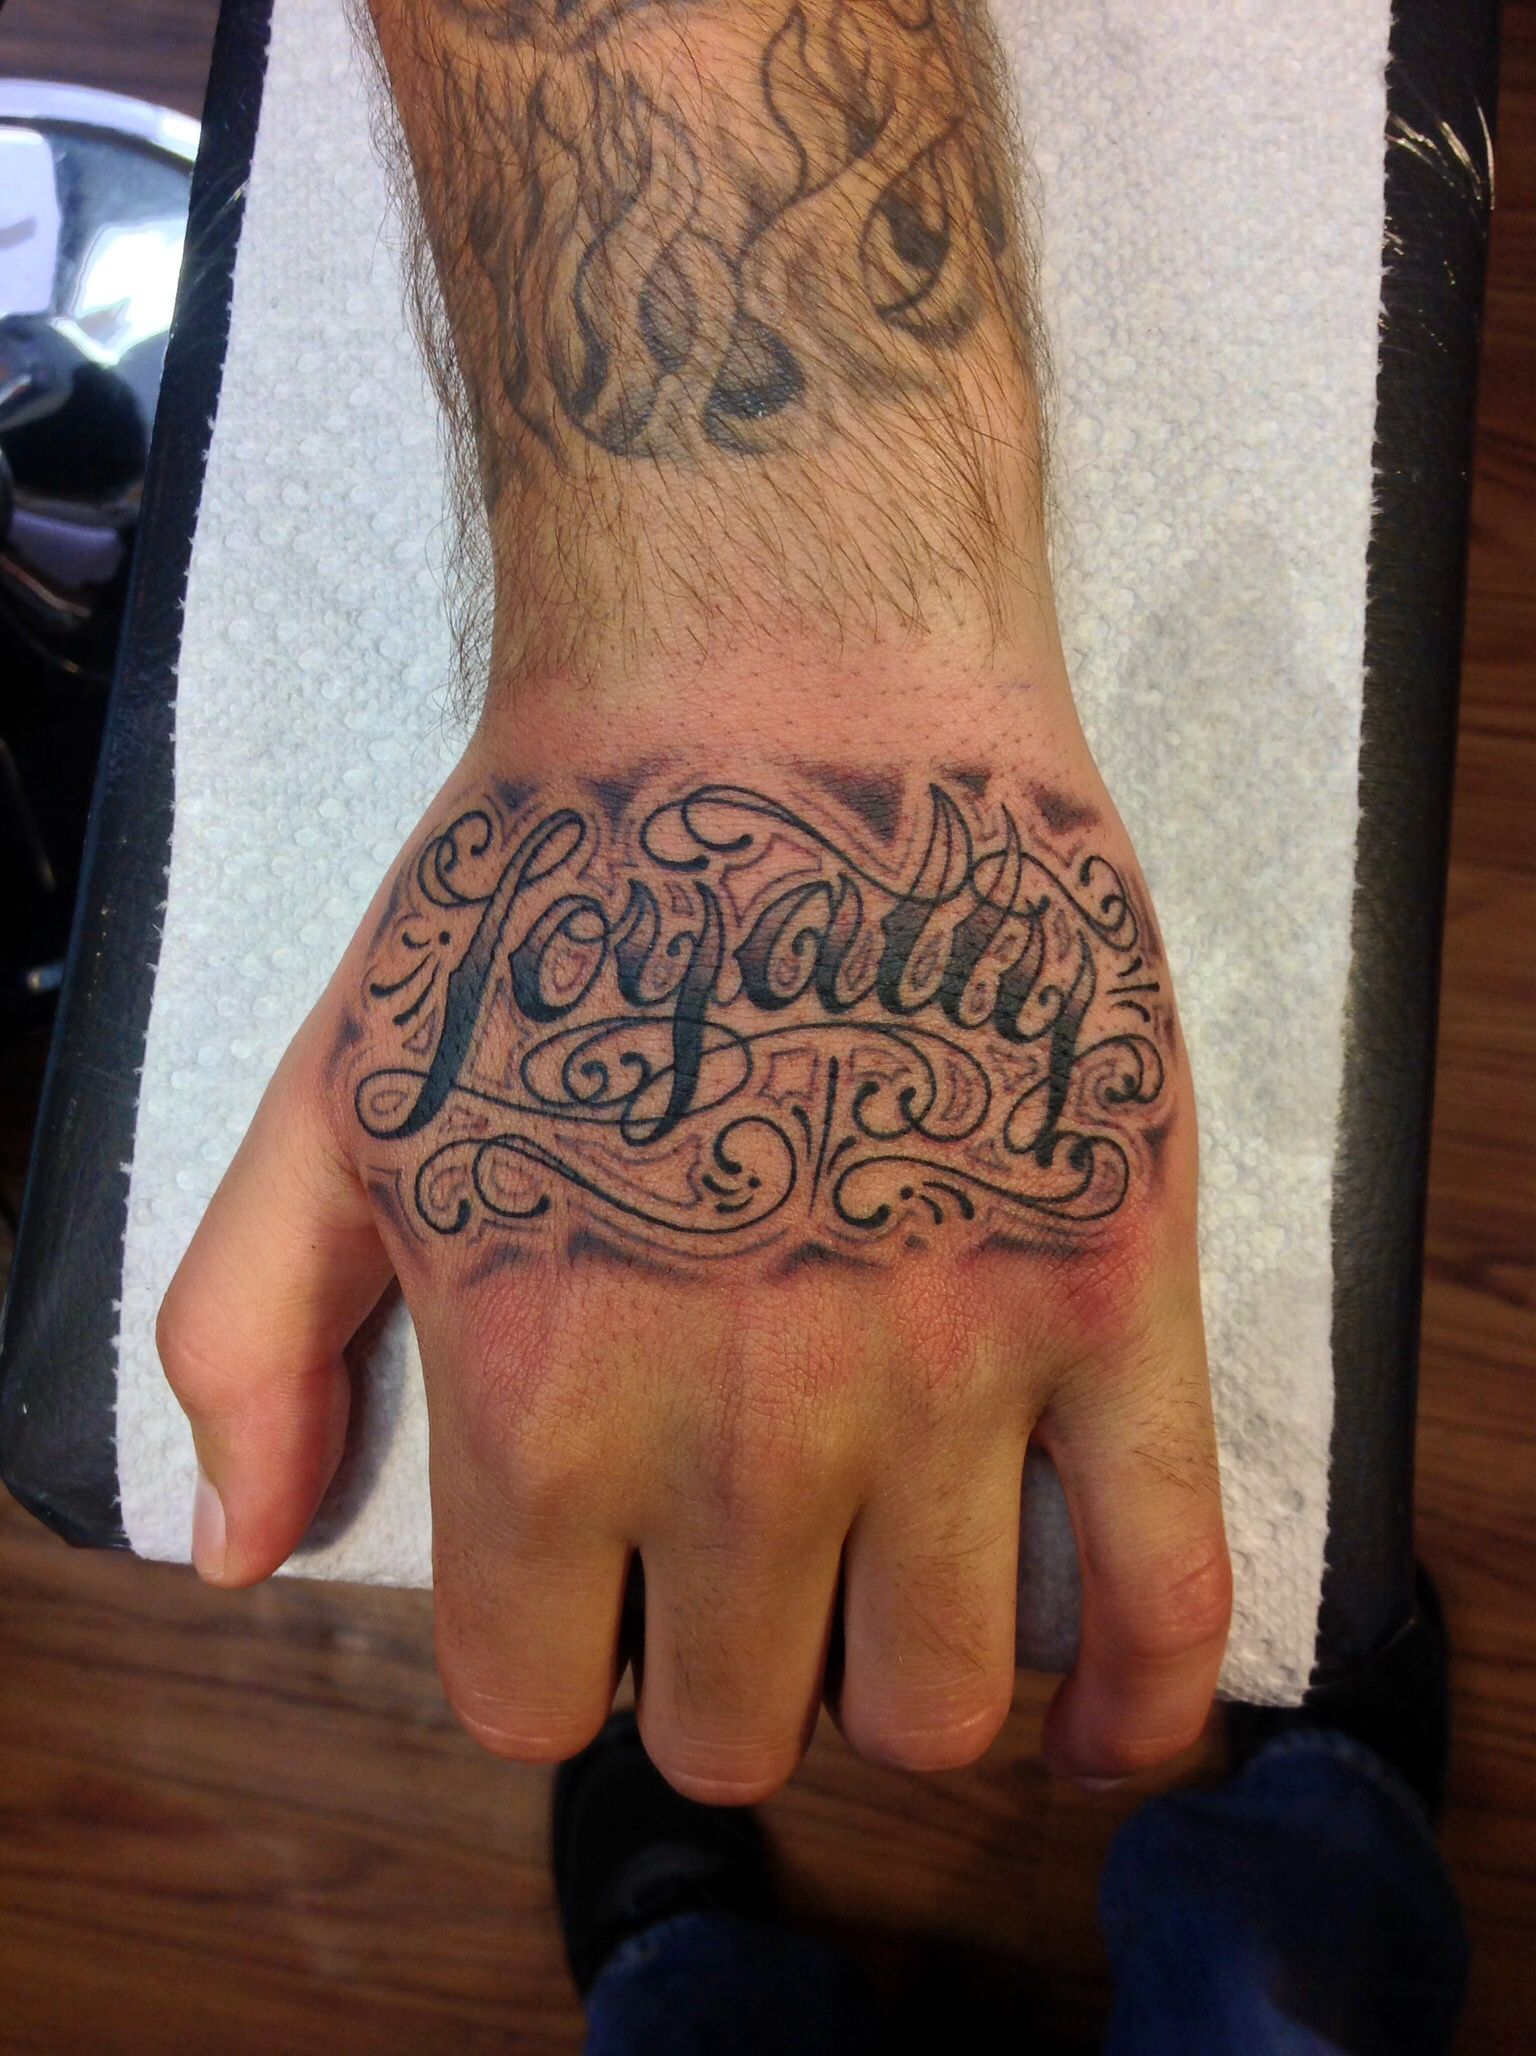 Tattoo Lettering Hand Tattoos Hand Tattoos For Guys Tattoos